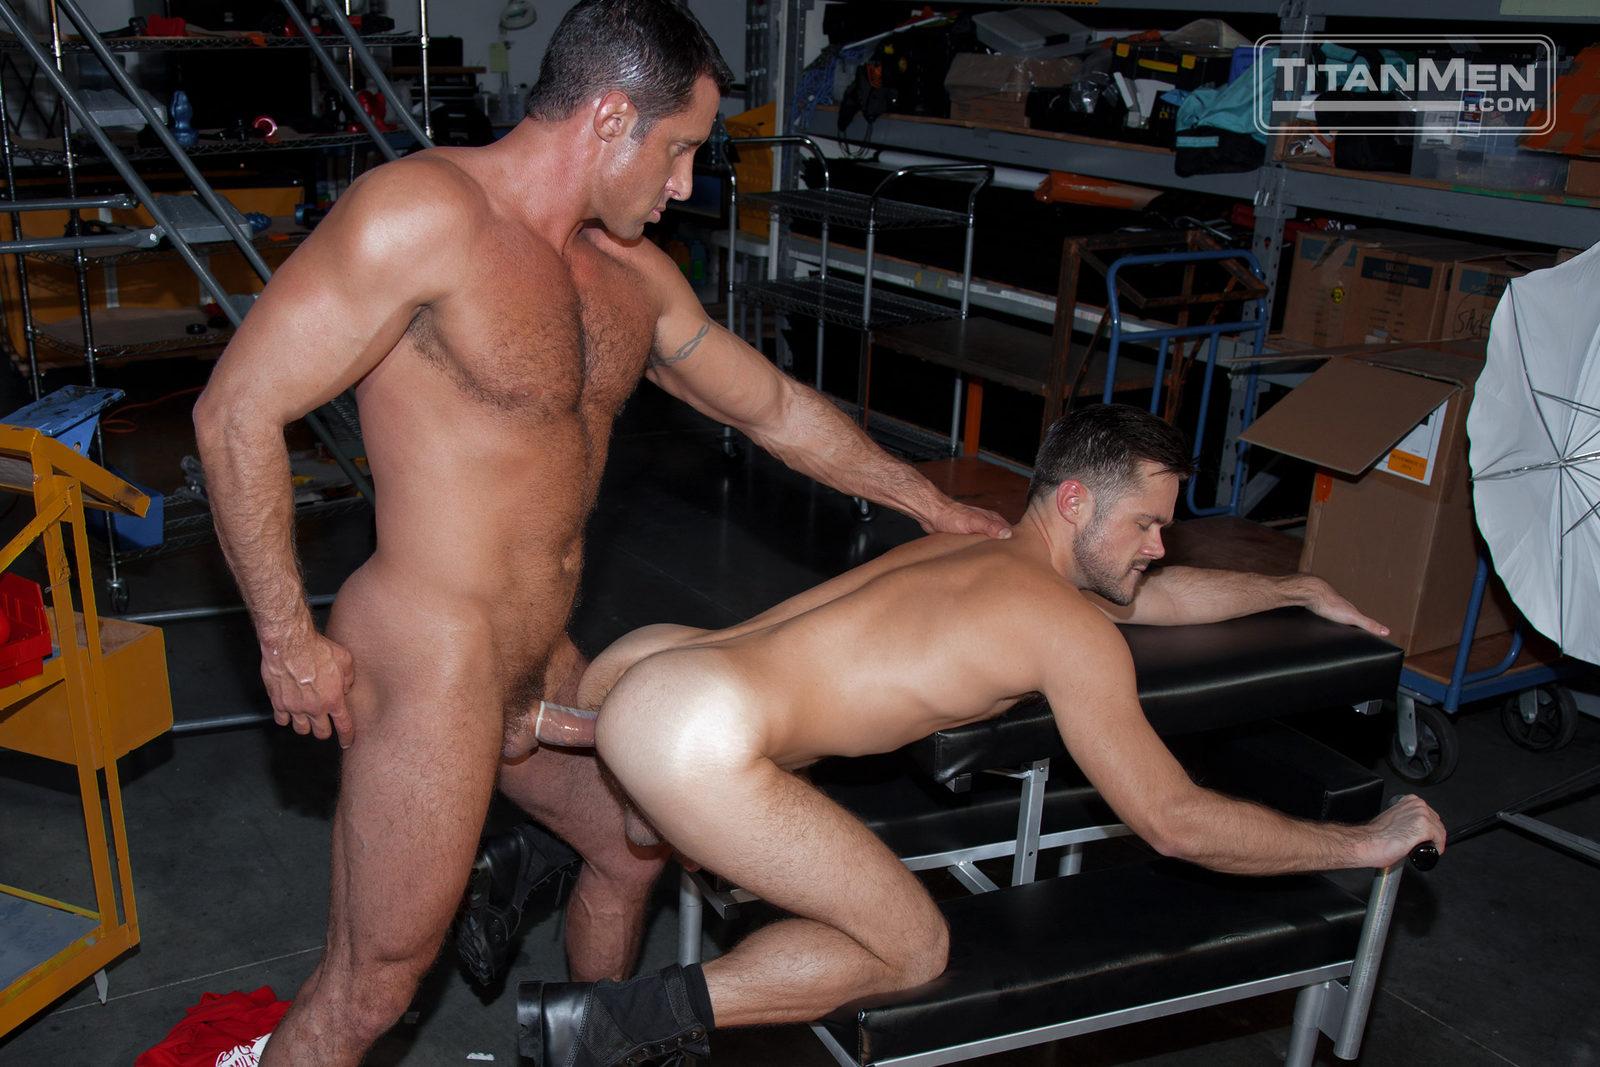 Titanmen man asses naked